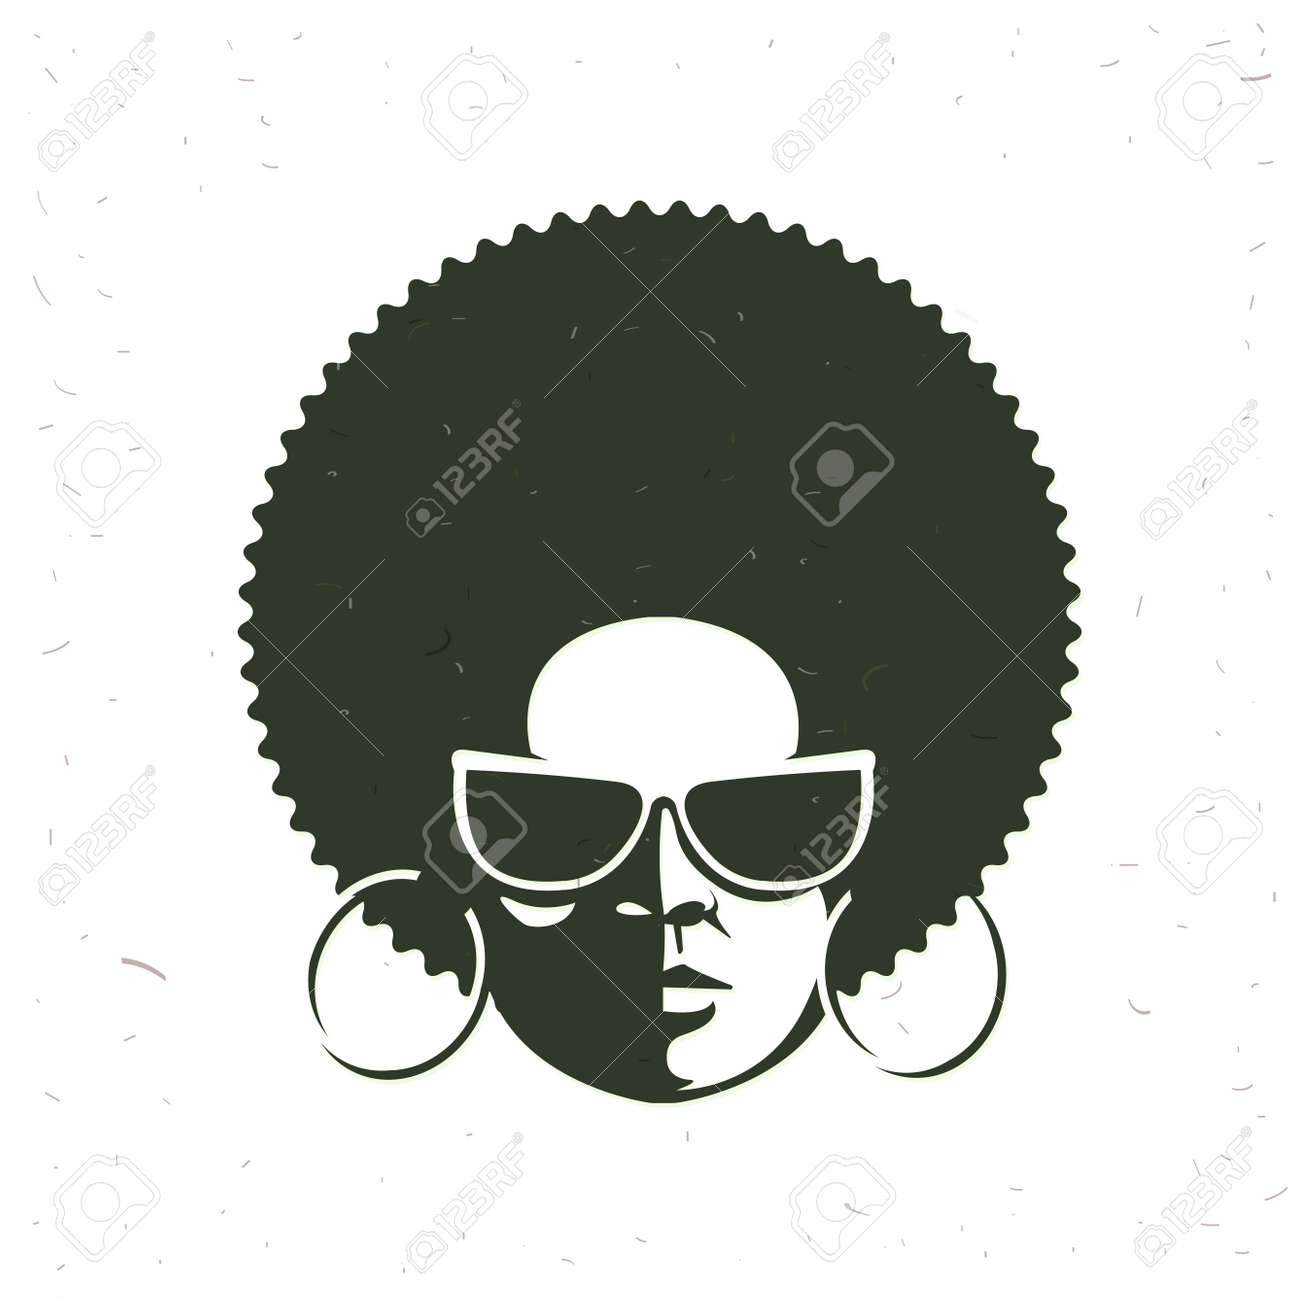 Front View Portrait Of A Black Woman Face With Sunglasses Vintage